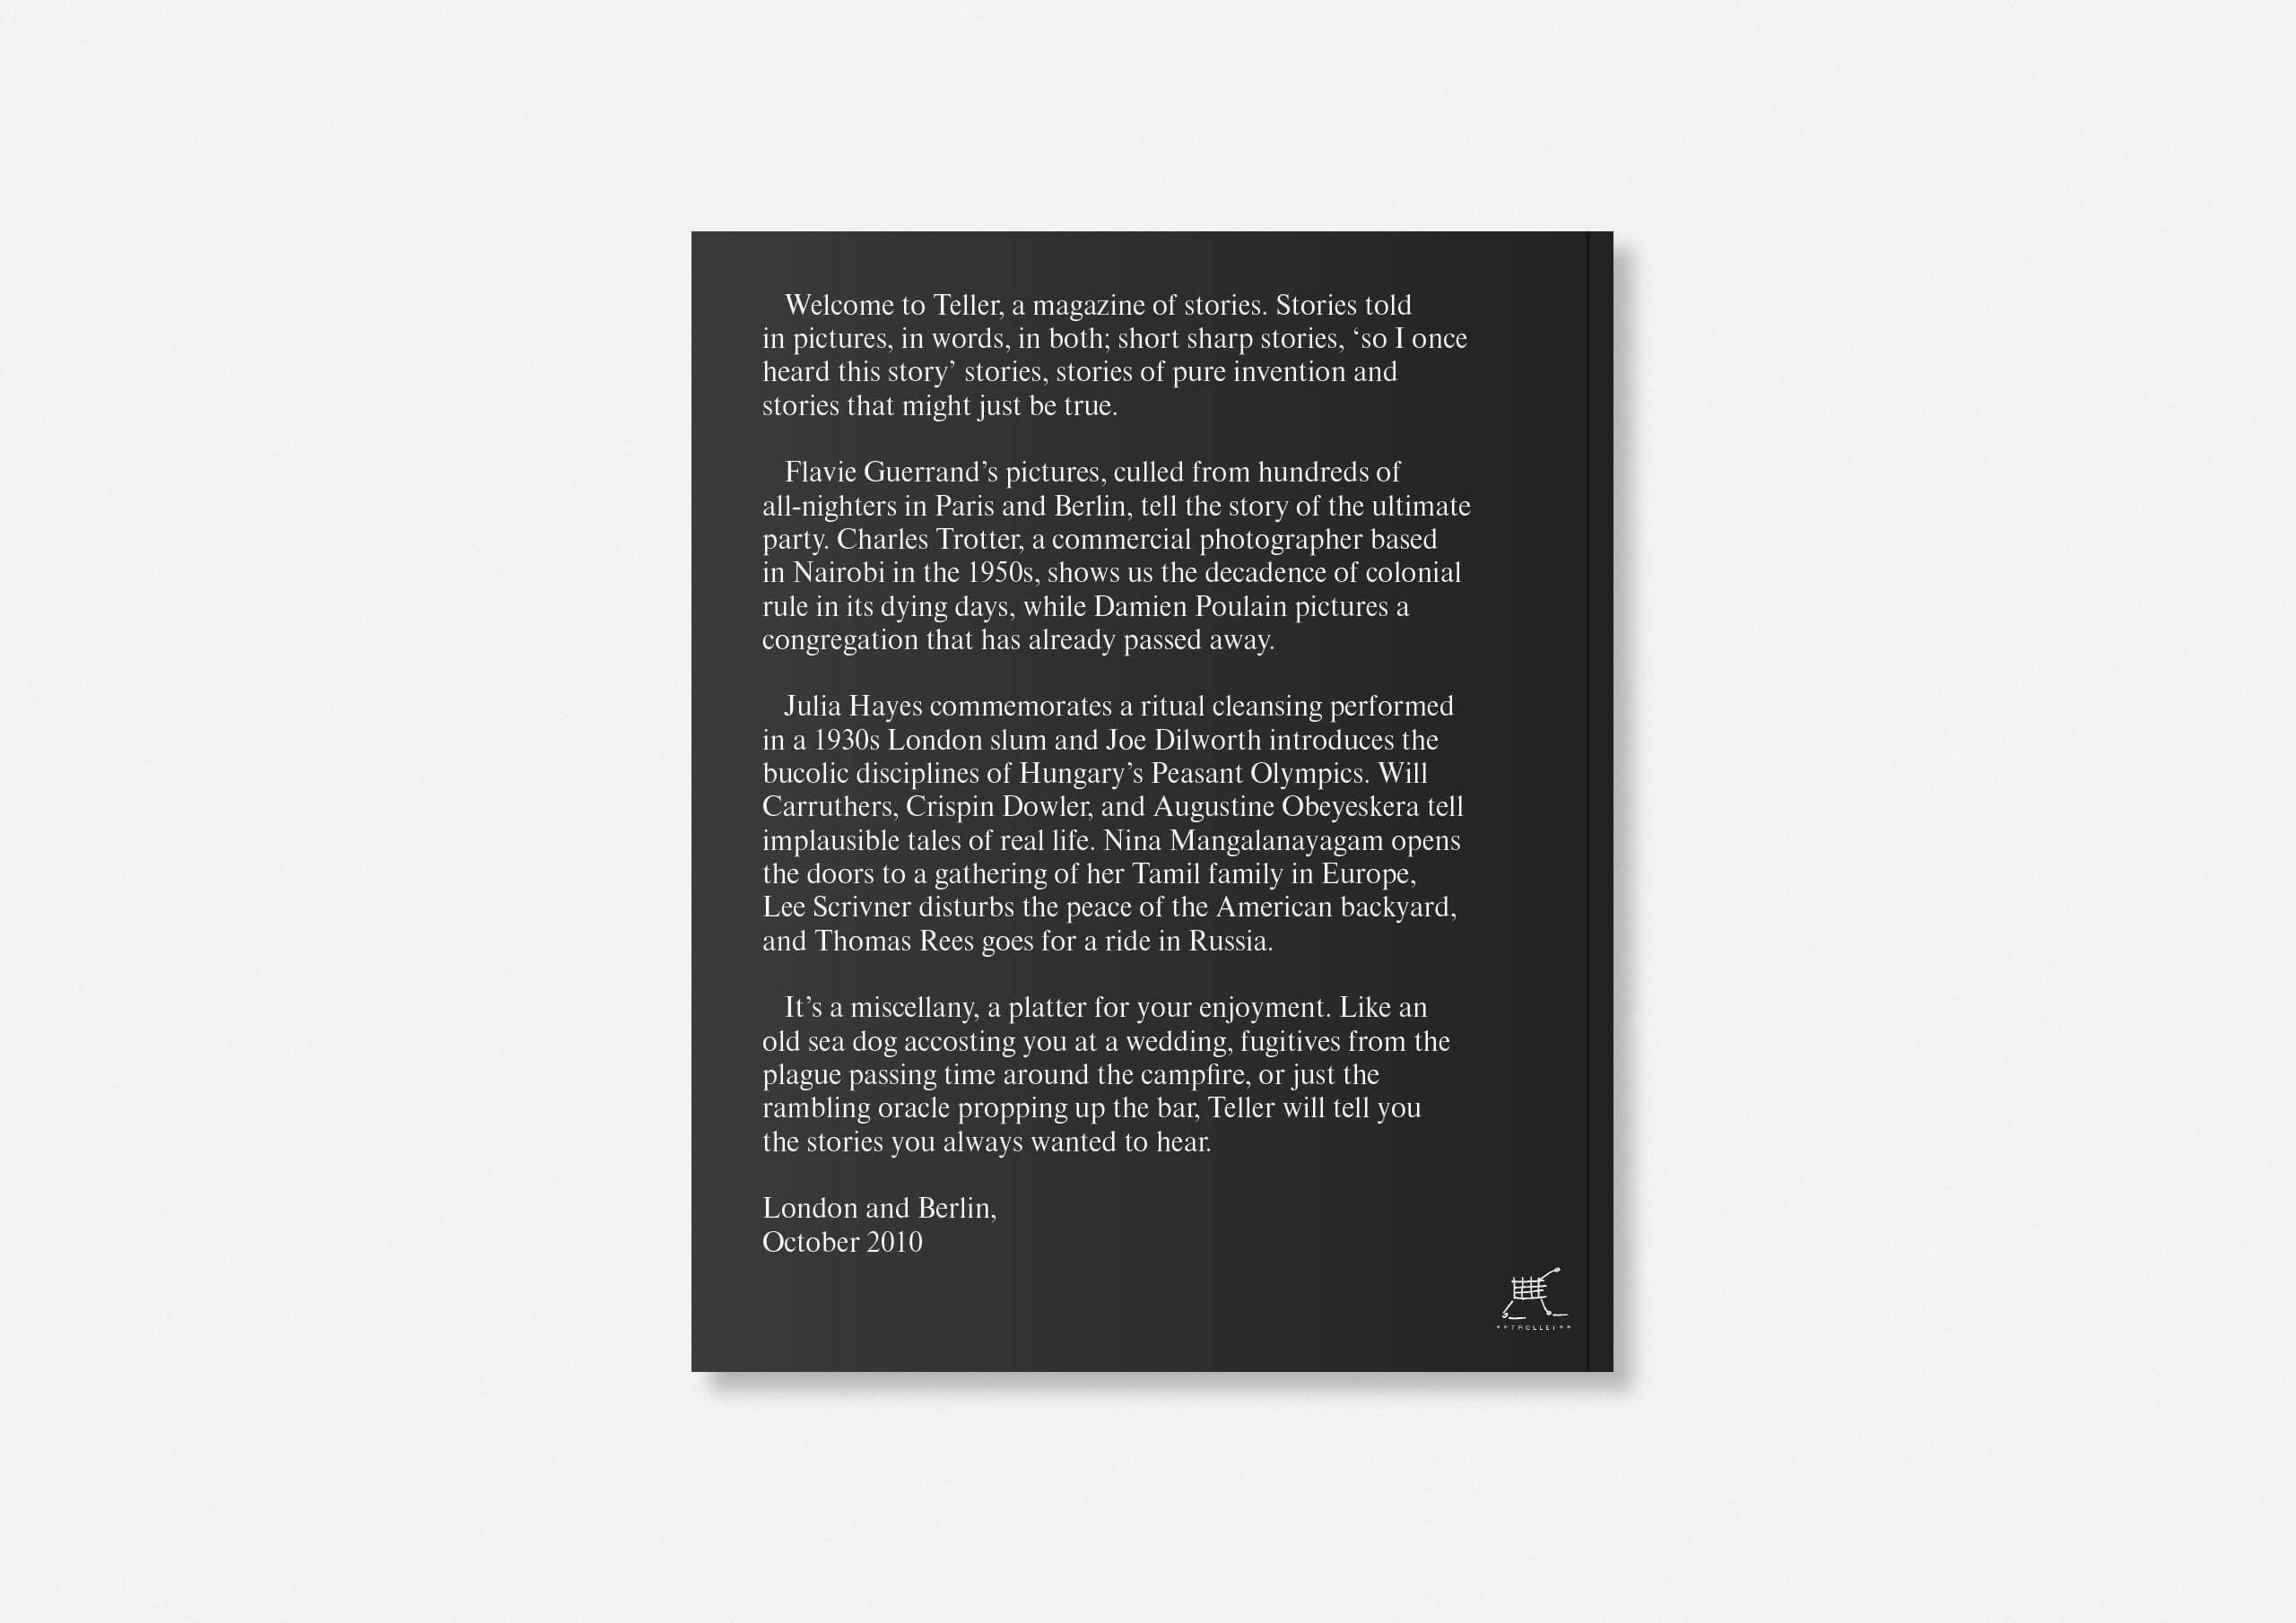 https://neuegestaltung.de/media/pages/clients/teller-magazine-issue-1/73b1dbd1a8-1597415428/teller_issue_01_ruckseite_ng.jpg